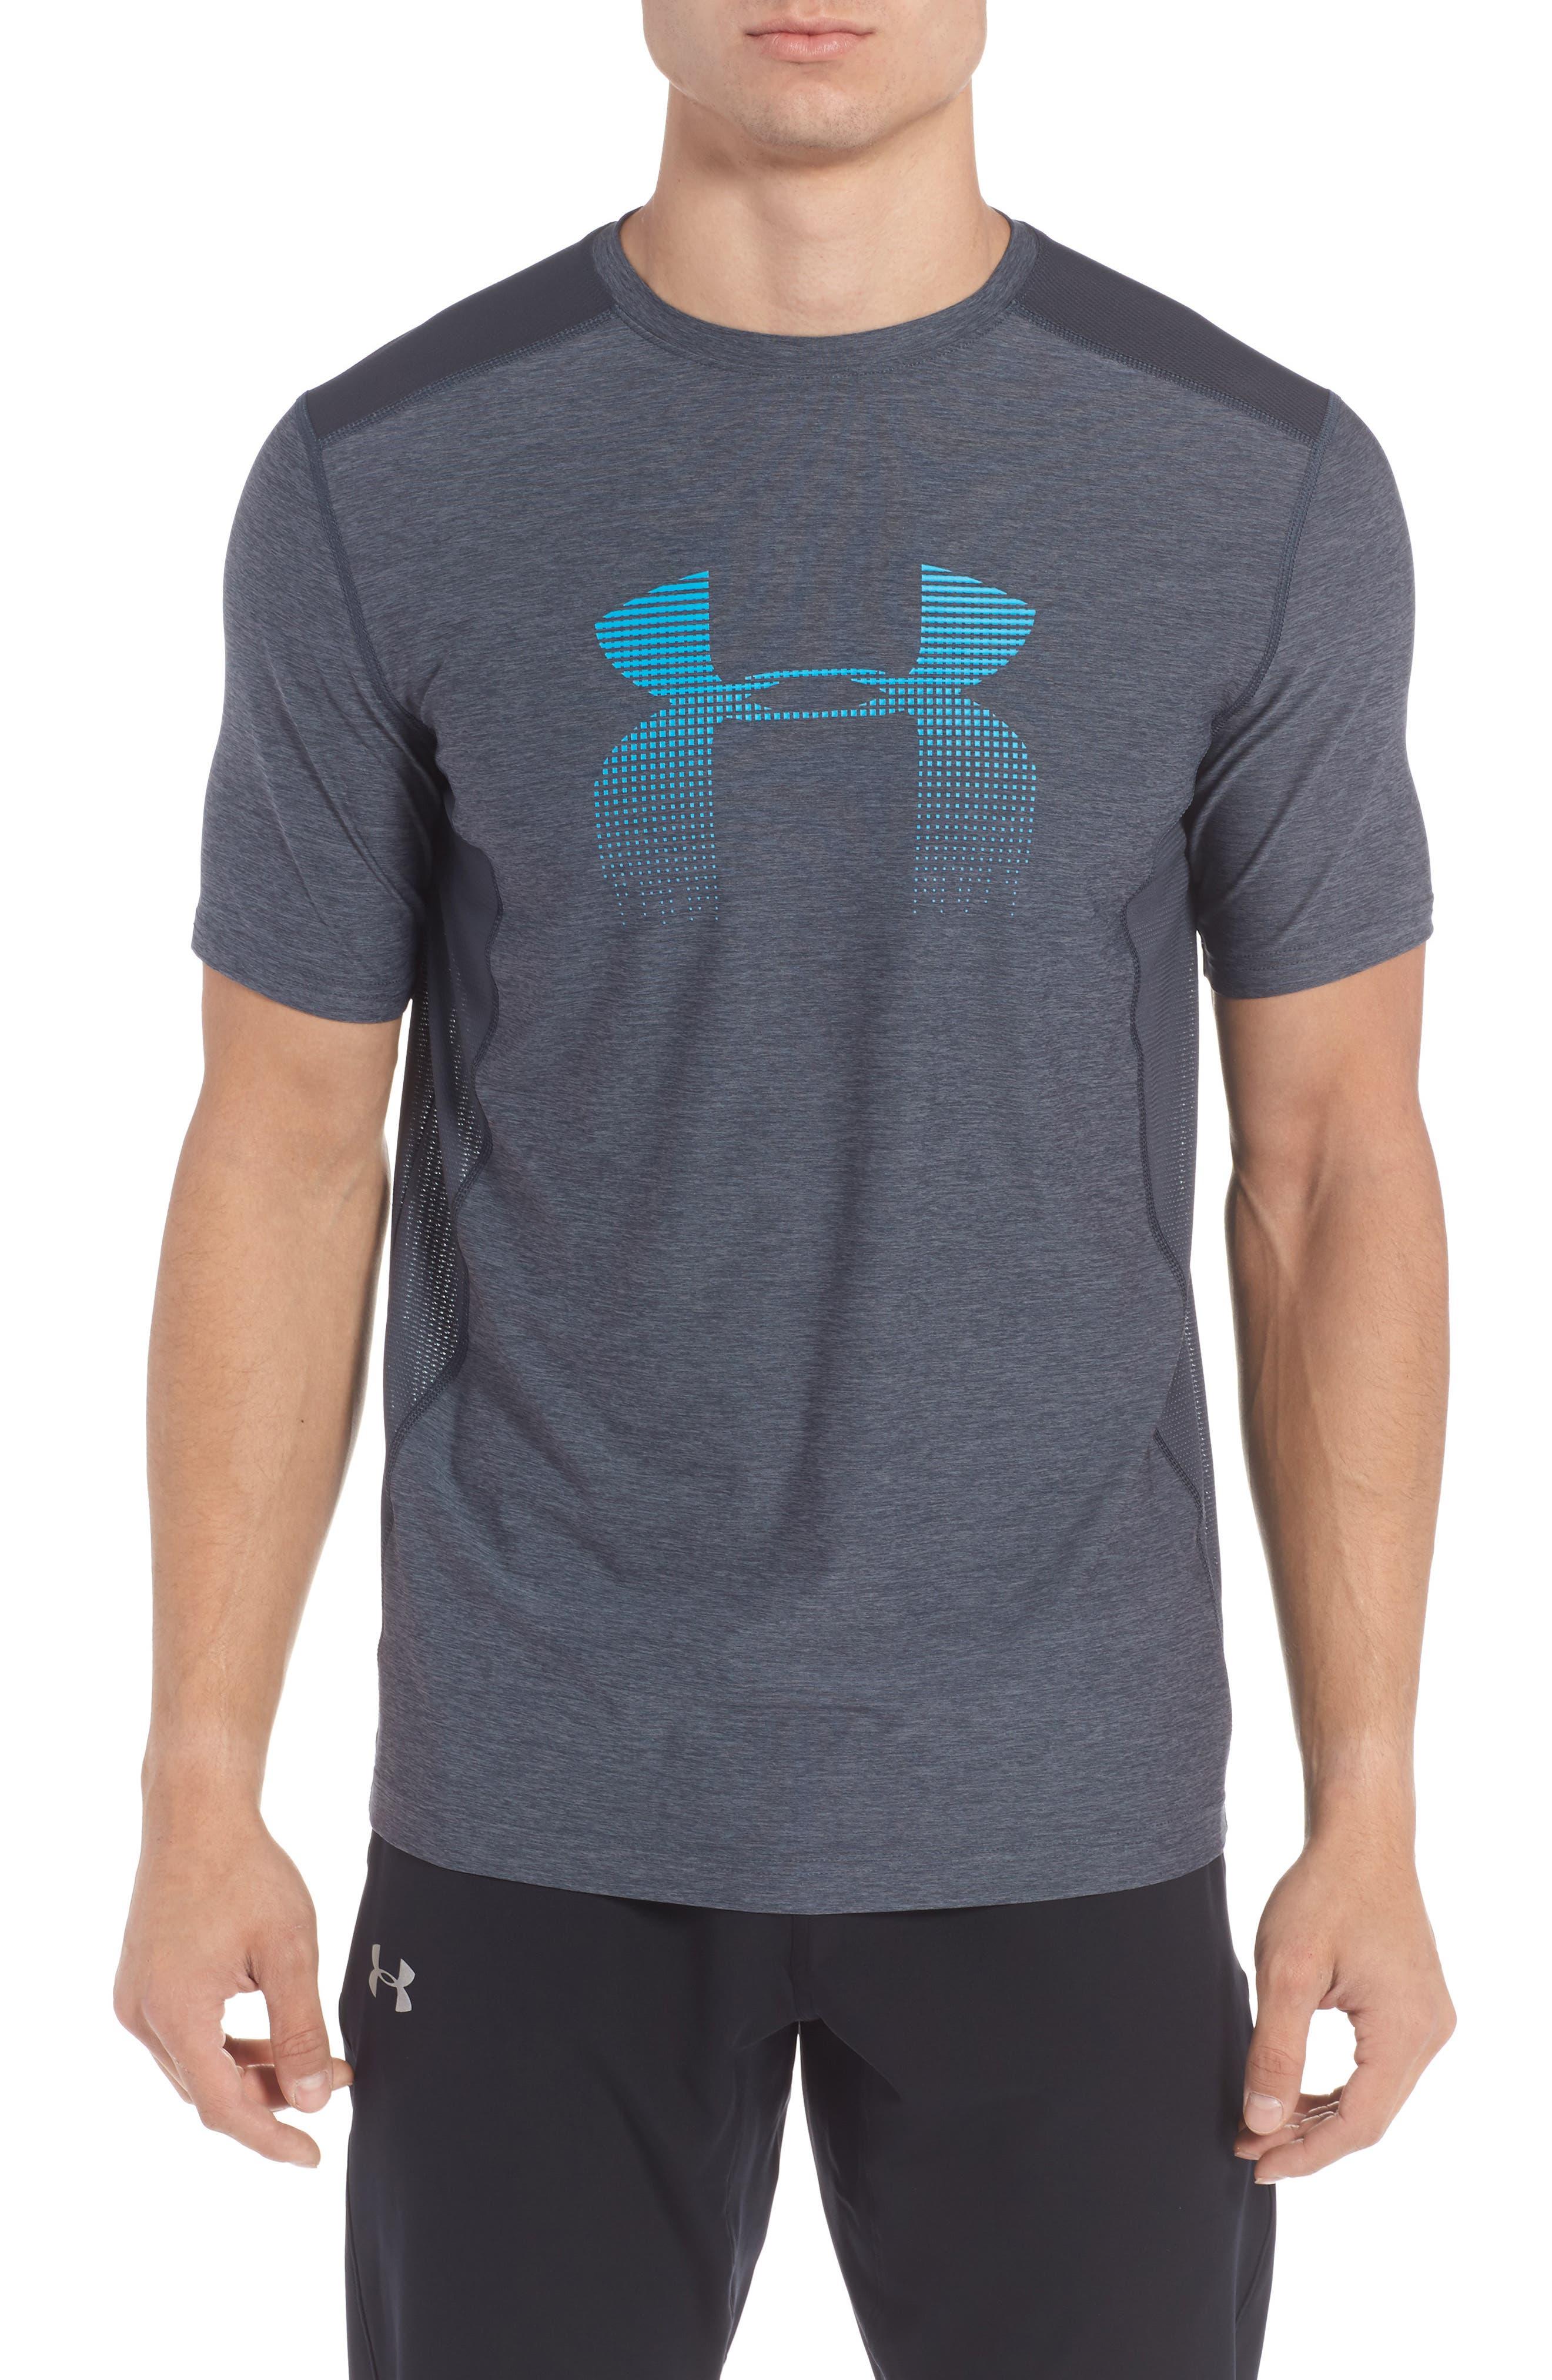 Main Image - Under Armour Raid Graphic T-Shirt